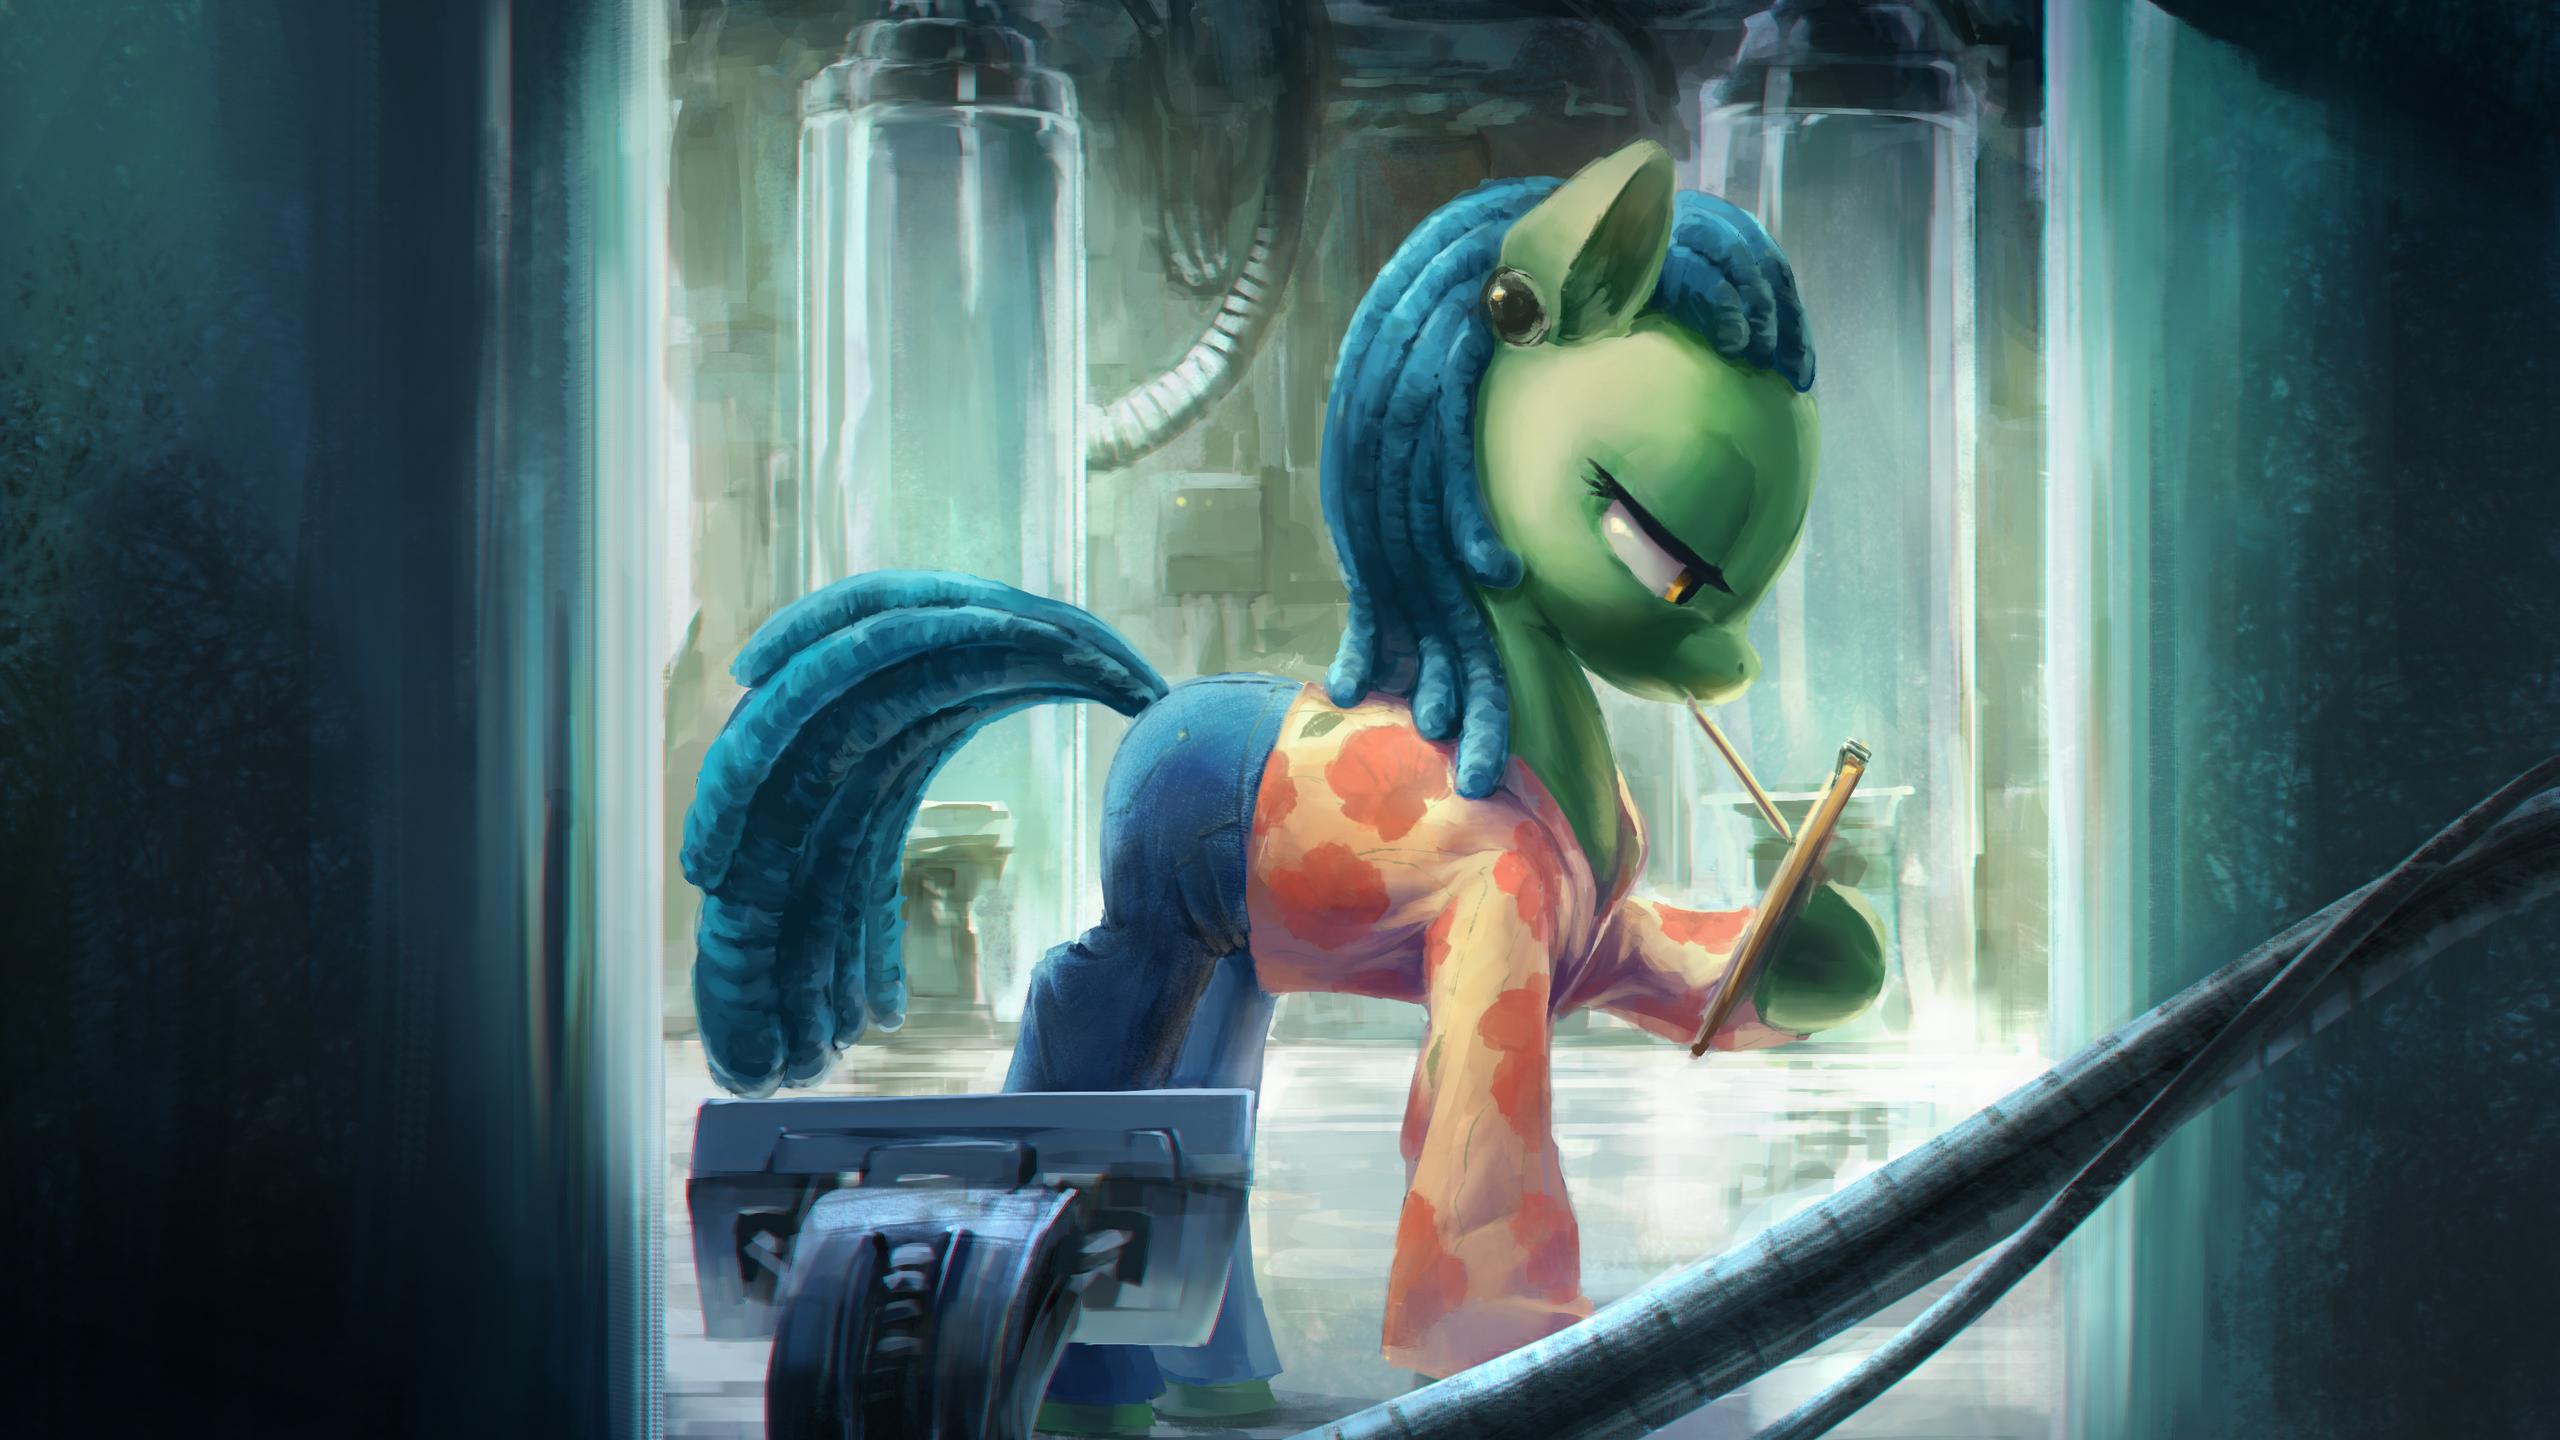 scientist-pony-ko.jpg